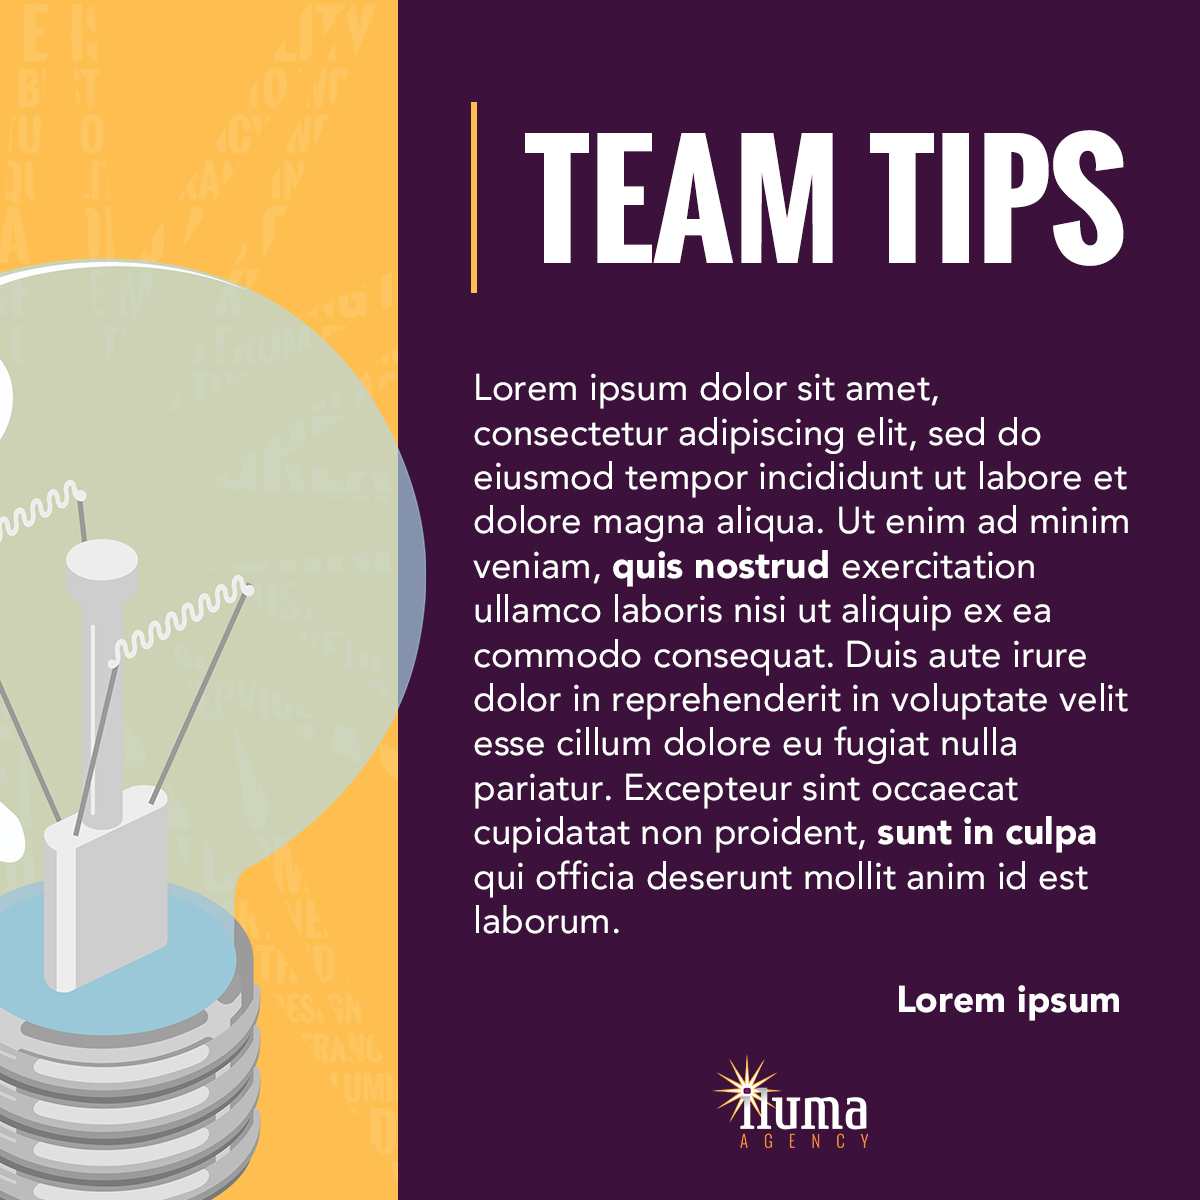 iA - Team Tip_Static.jpg